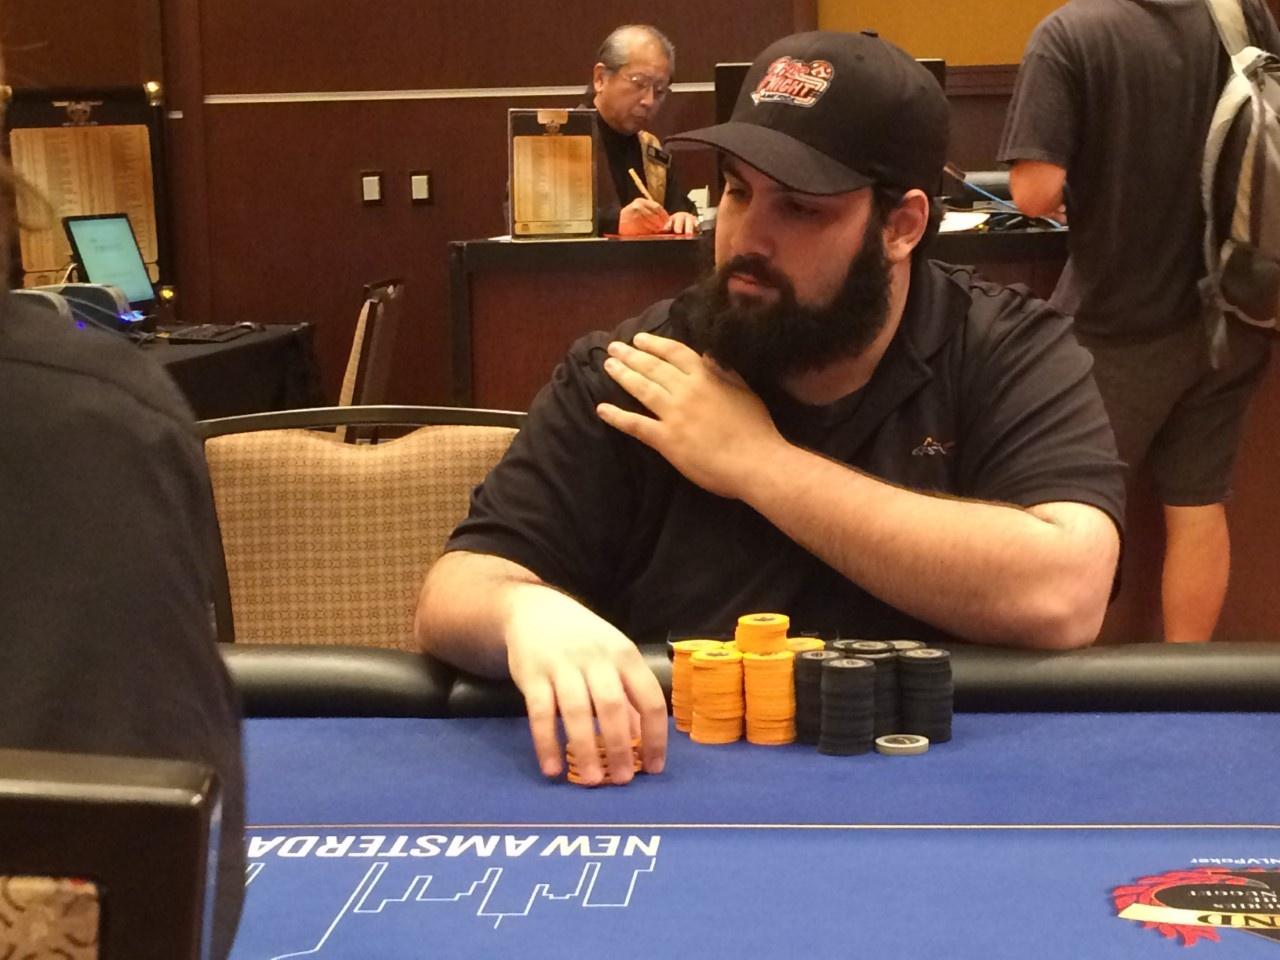 golden nugget online casino american poker 2 spielen